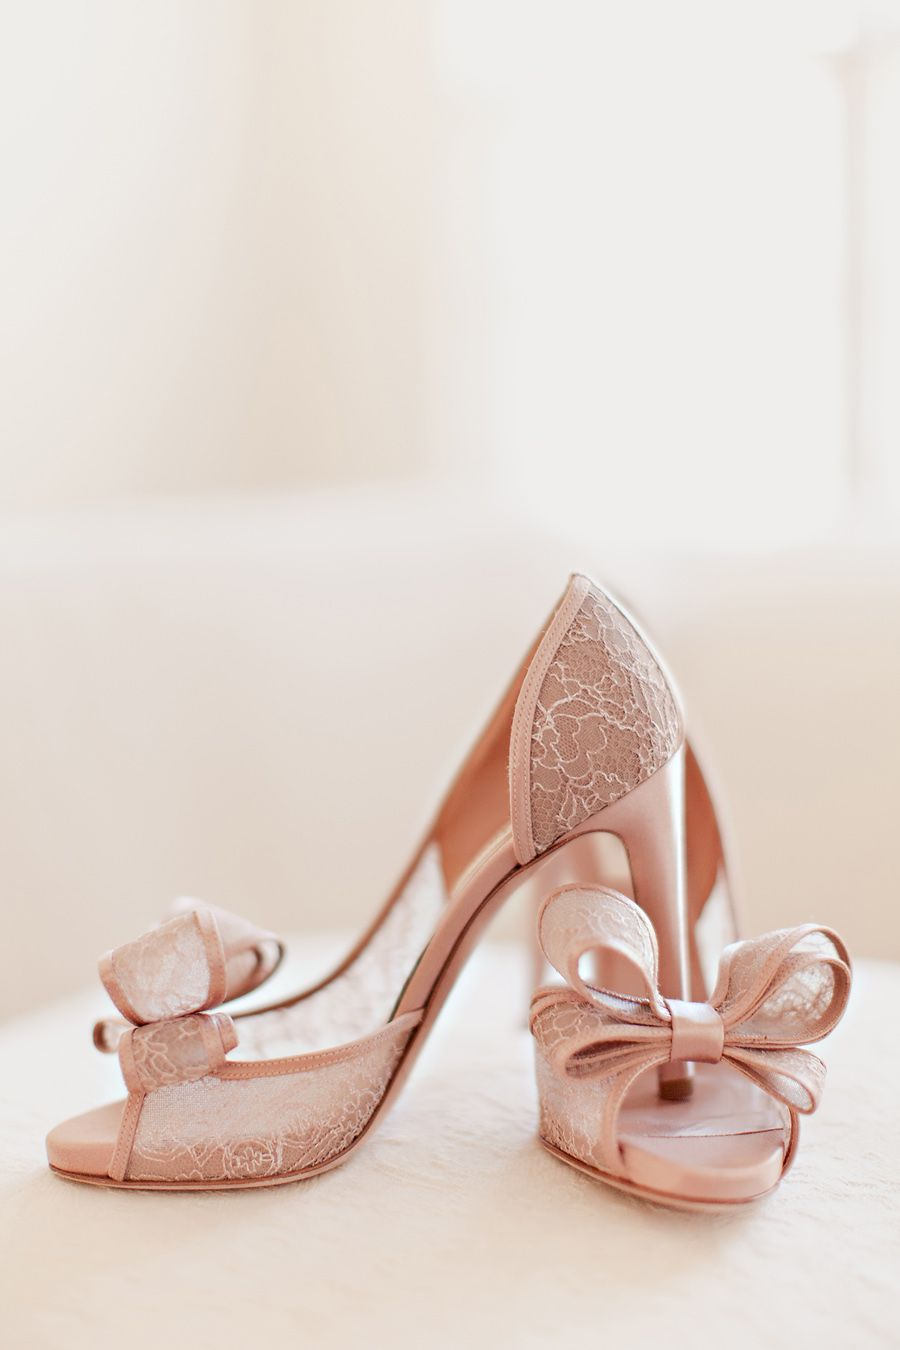 595e06edb37 Blush Colored Lace Bridal Shoes